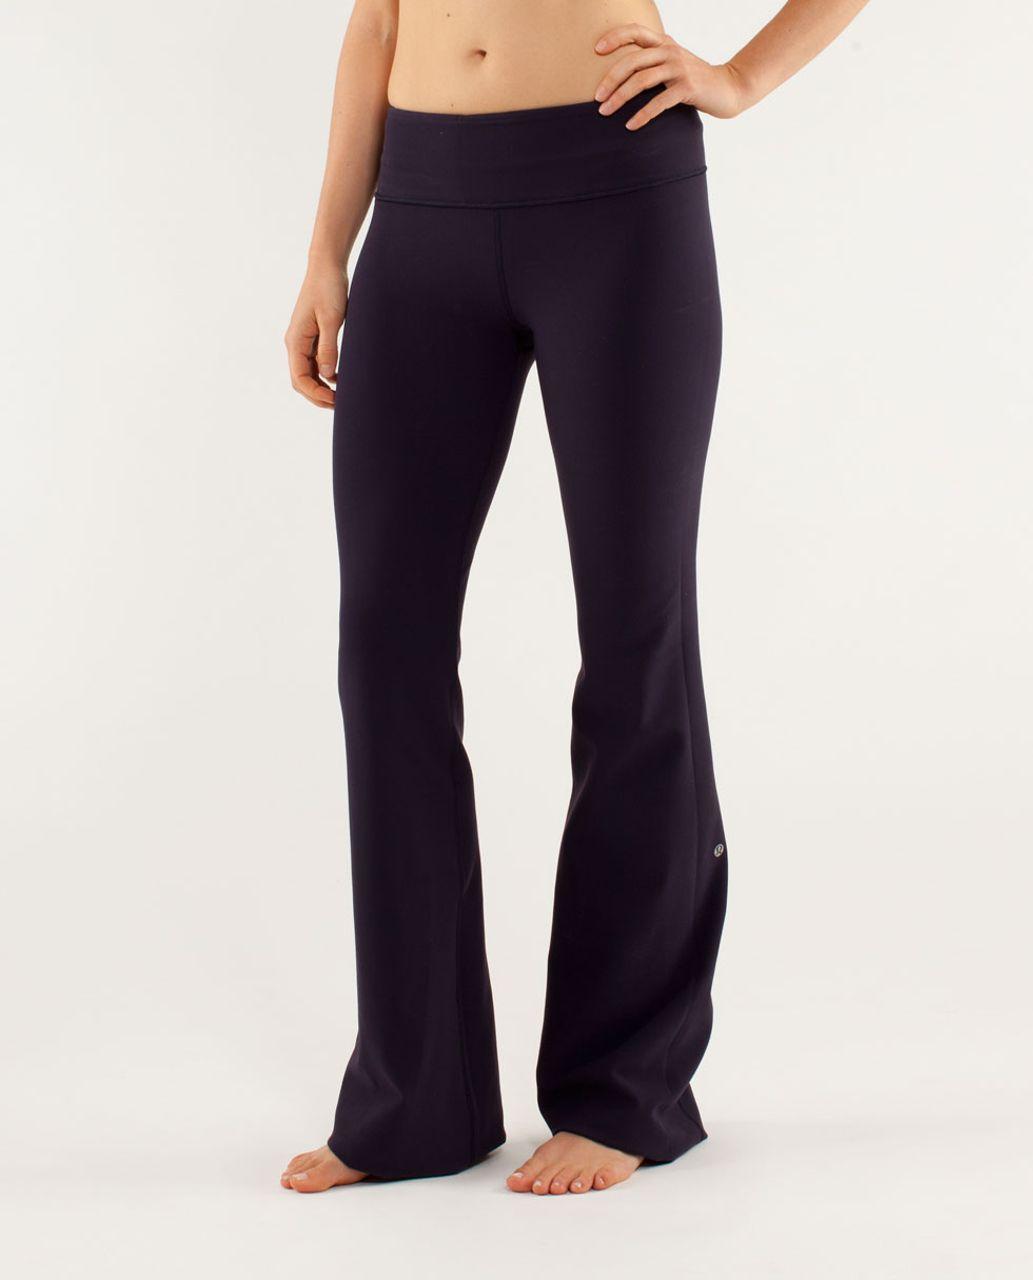 Lululemon Groove Pant *Slim (Regular) - Black Swan / Herringbone Black Swan / Slope Stripe Raspberry Glo Light